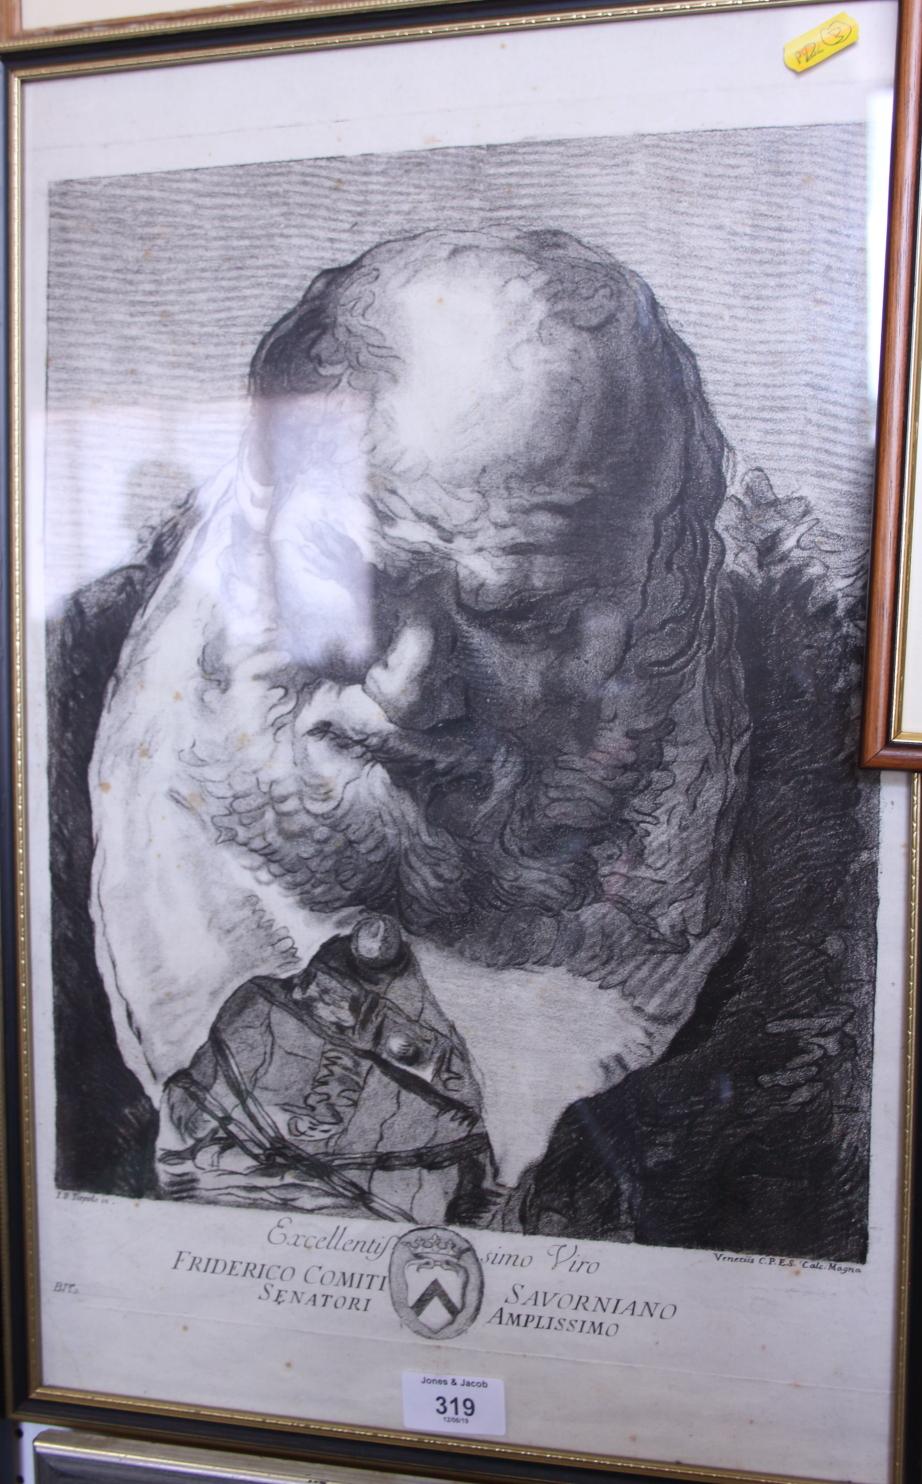 "Giambattista Tiepolo: 18th century crayon manner/mezzotint, ""Friderico Comiti Savorniano"", in"